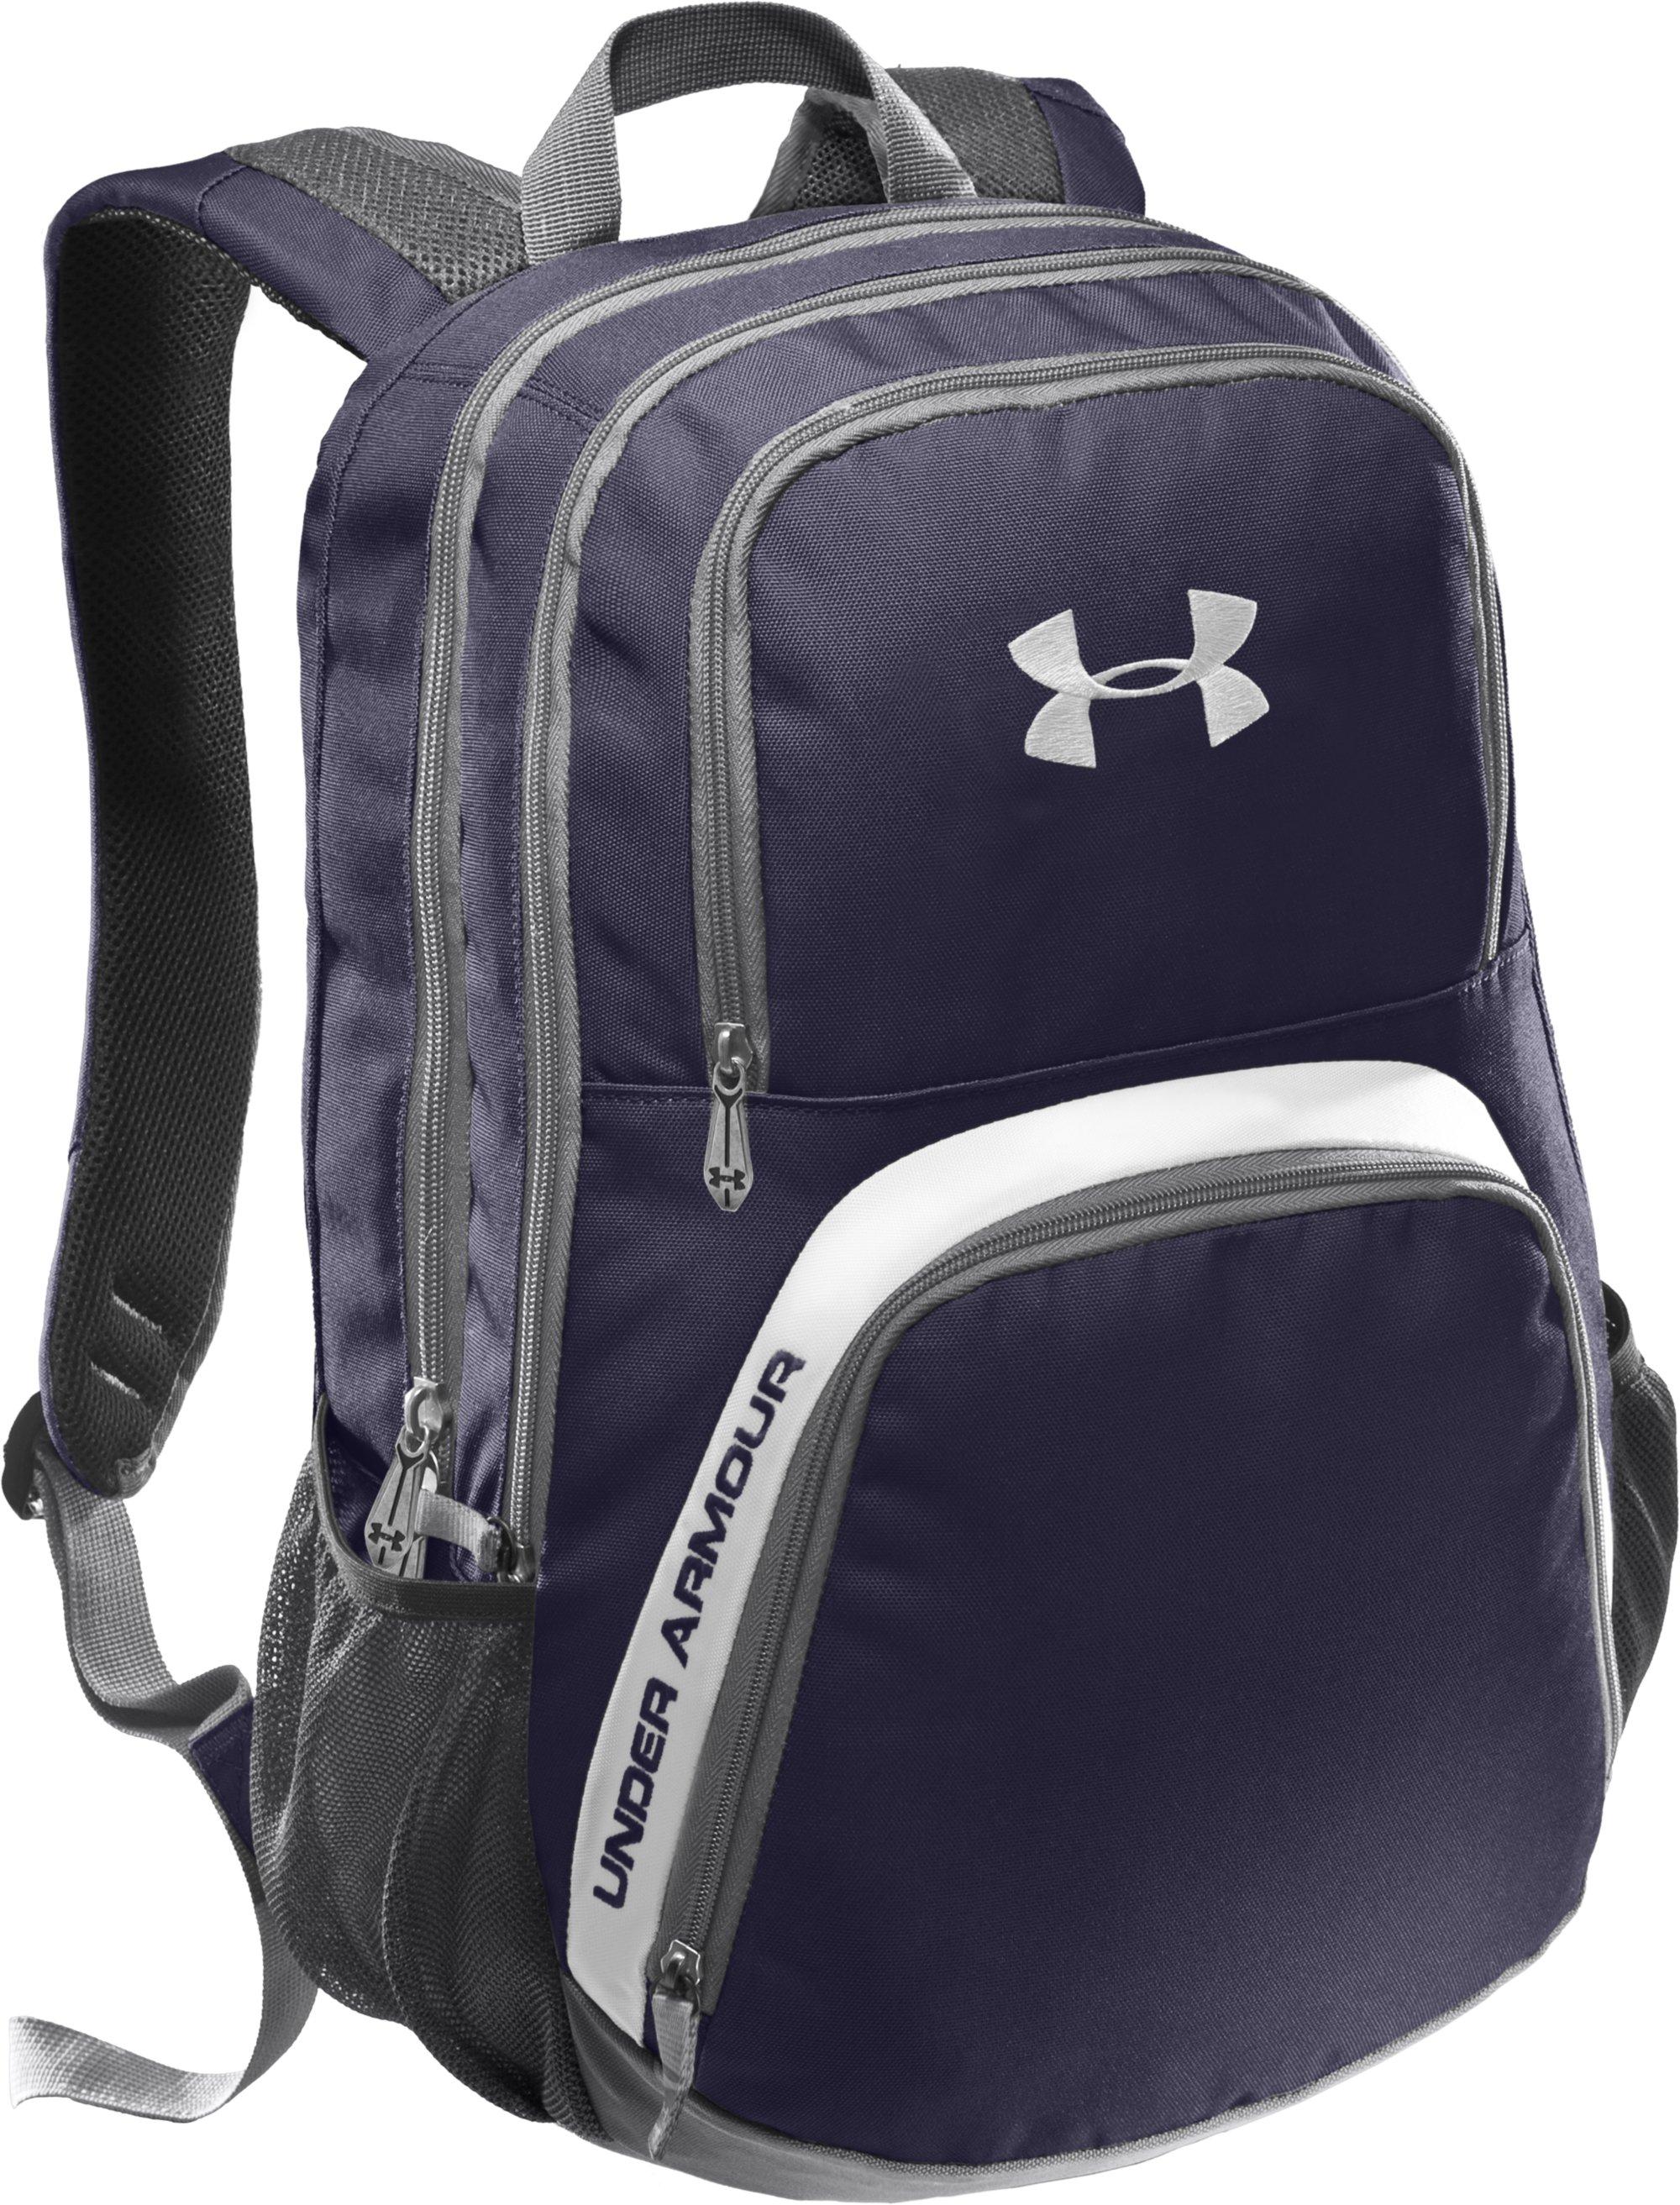 The Best School Backpacks - Crazy Backpacks